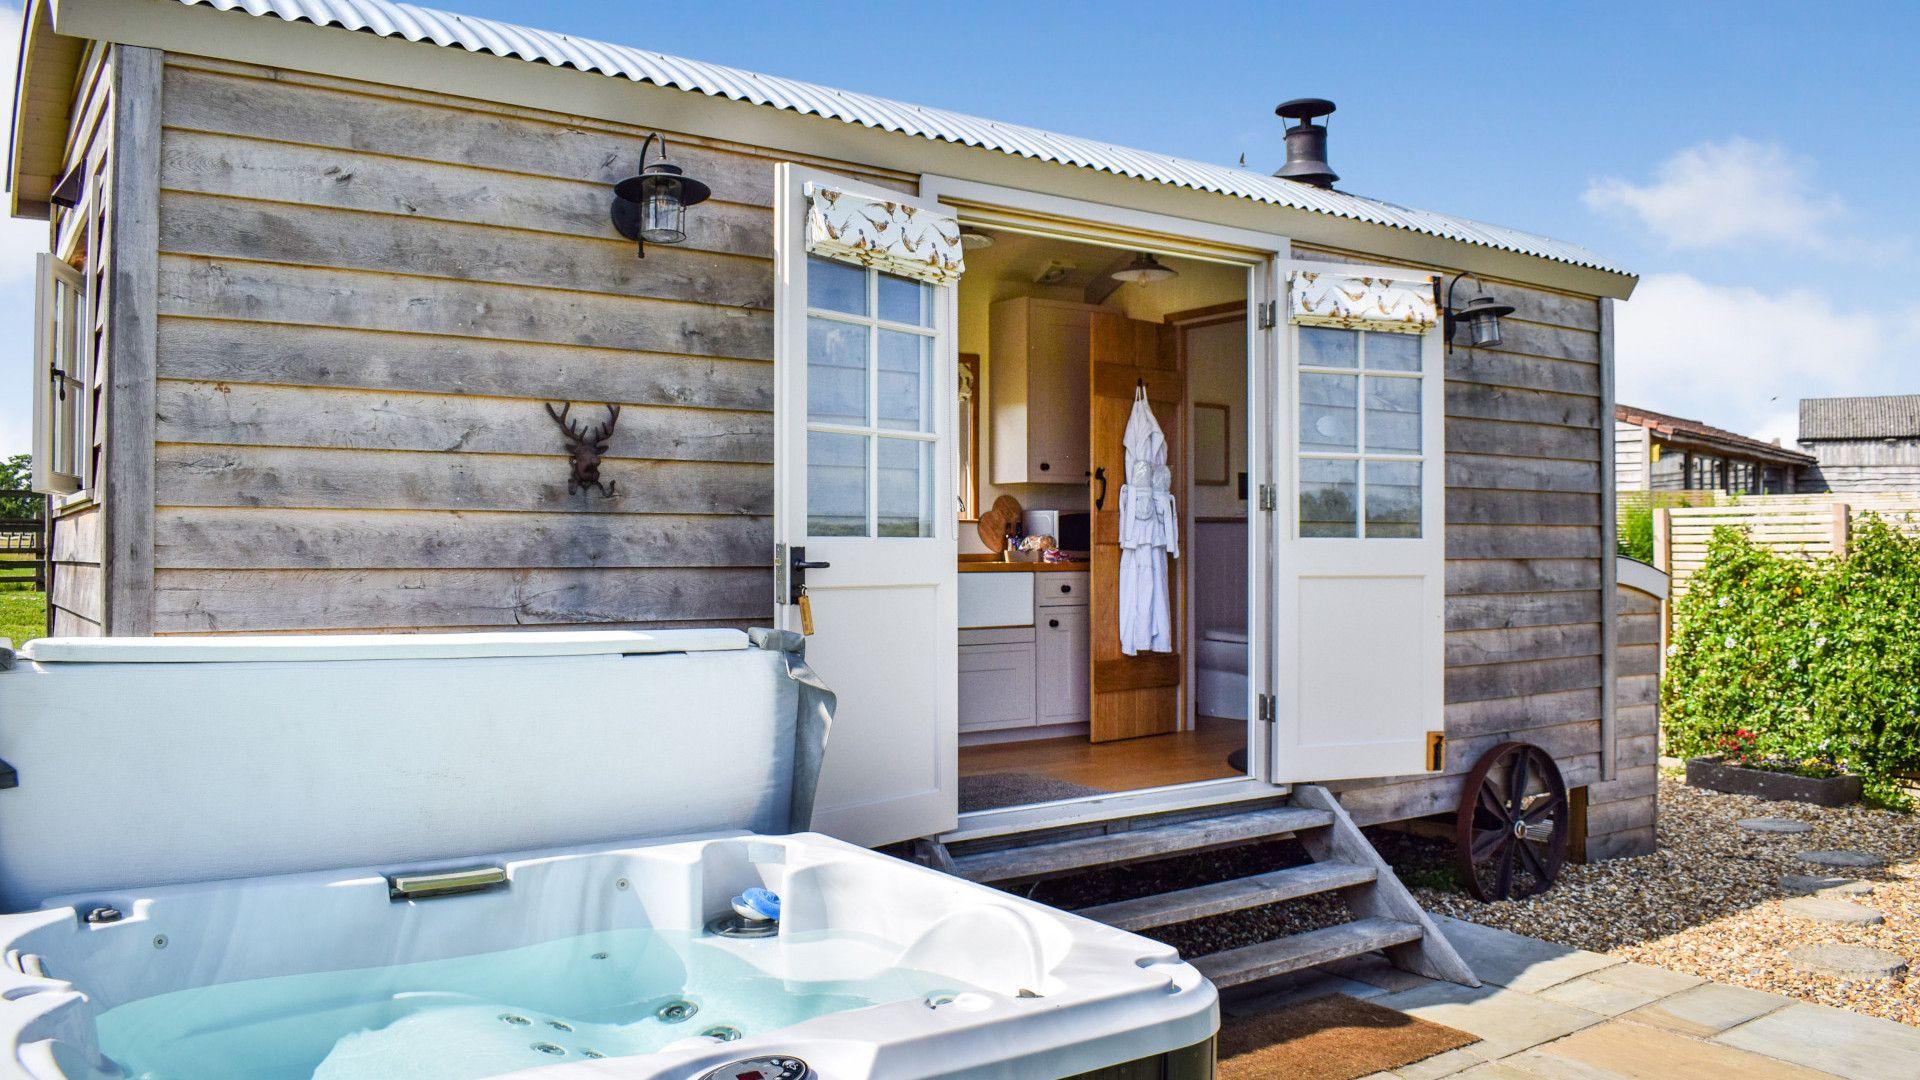 Shepherds Hut with hot tub, Shepherds Hut at Avon Farm, Bolthole Retreats